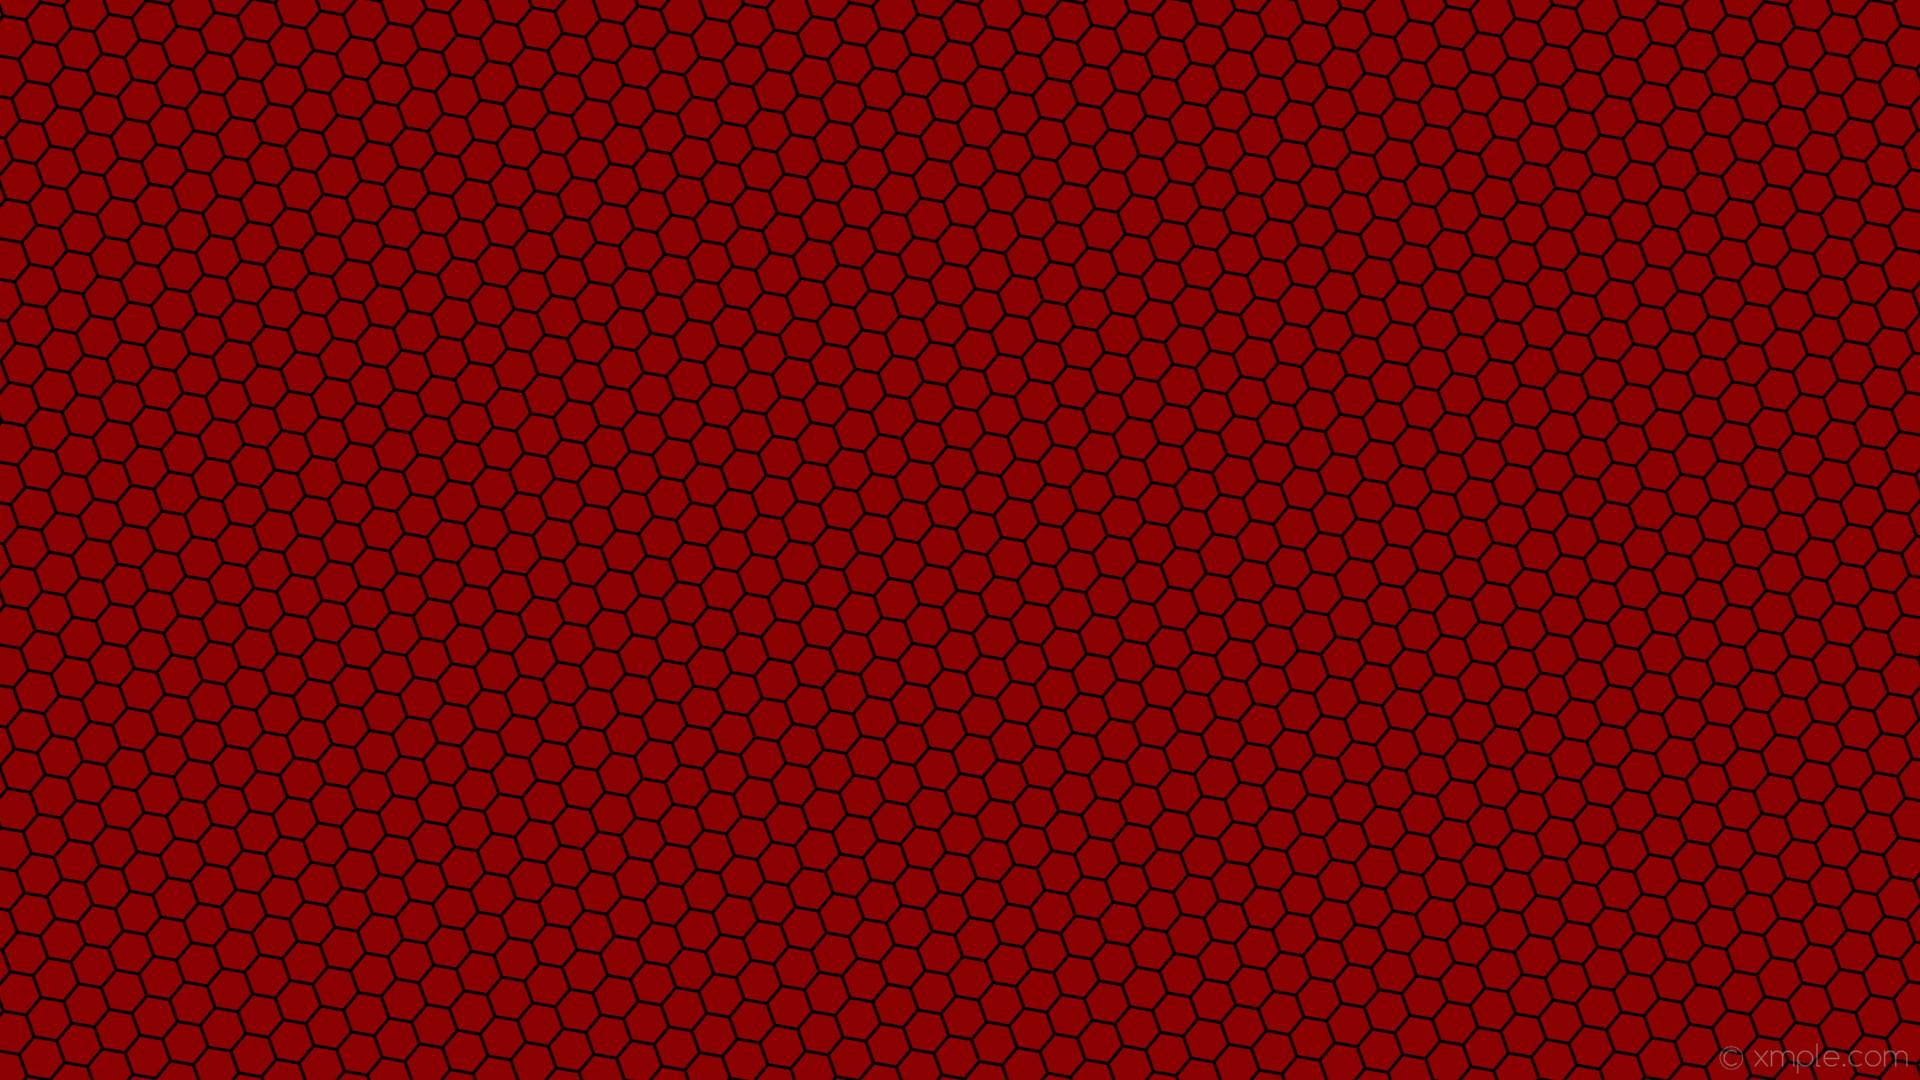 wallpaper beehive red hexagon honeycomb black dark red #8b0000 #000000  diagonal 20° 3px